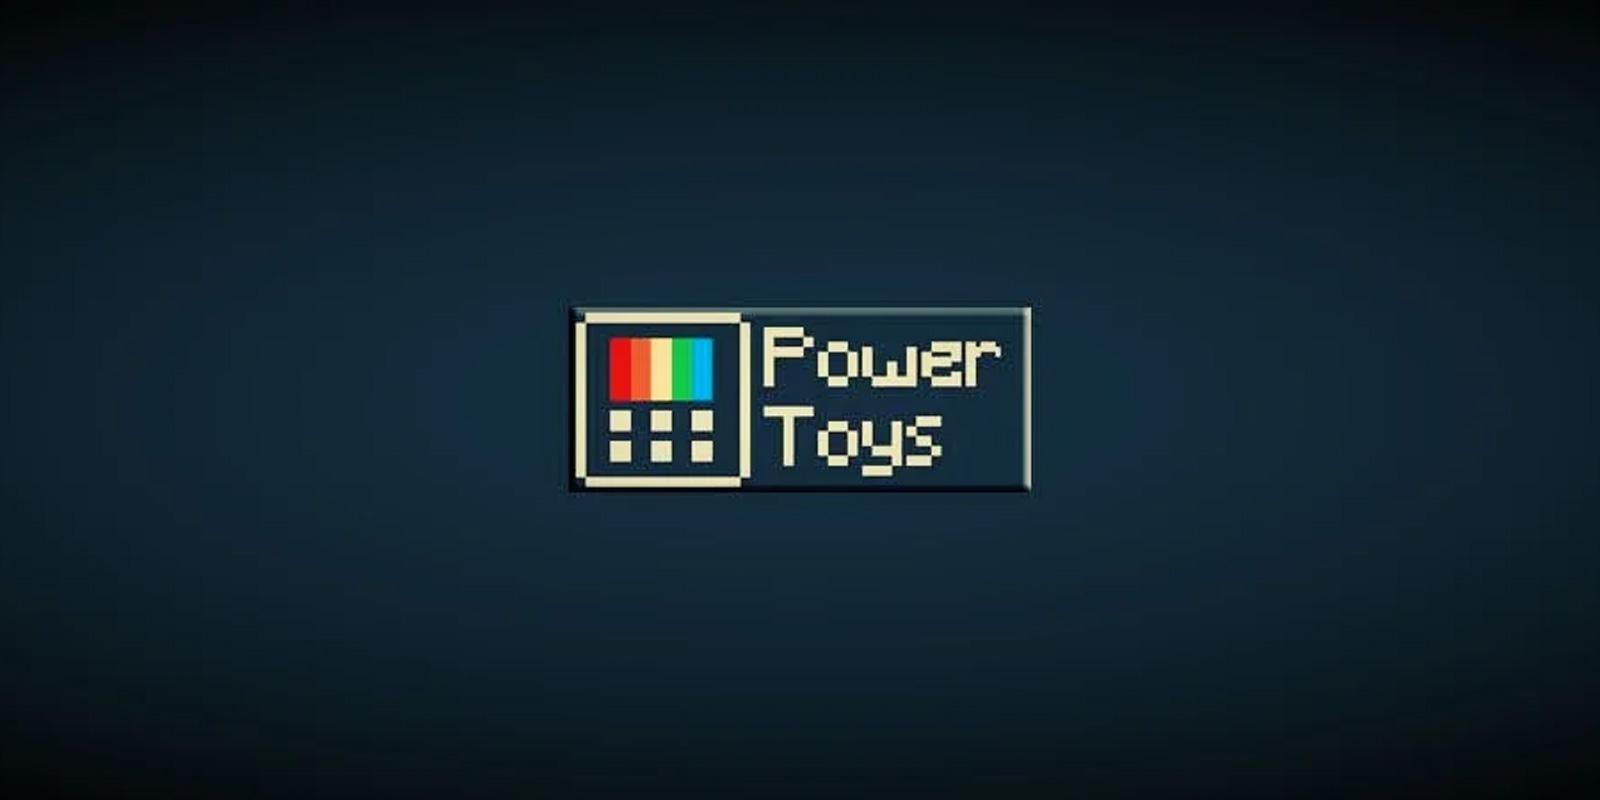 Windows 10 Power Toys